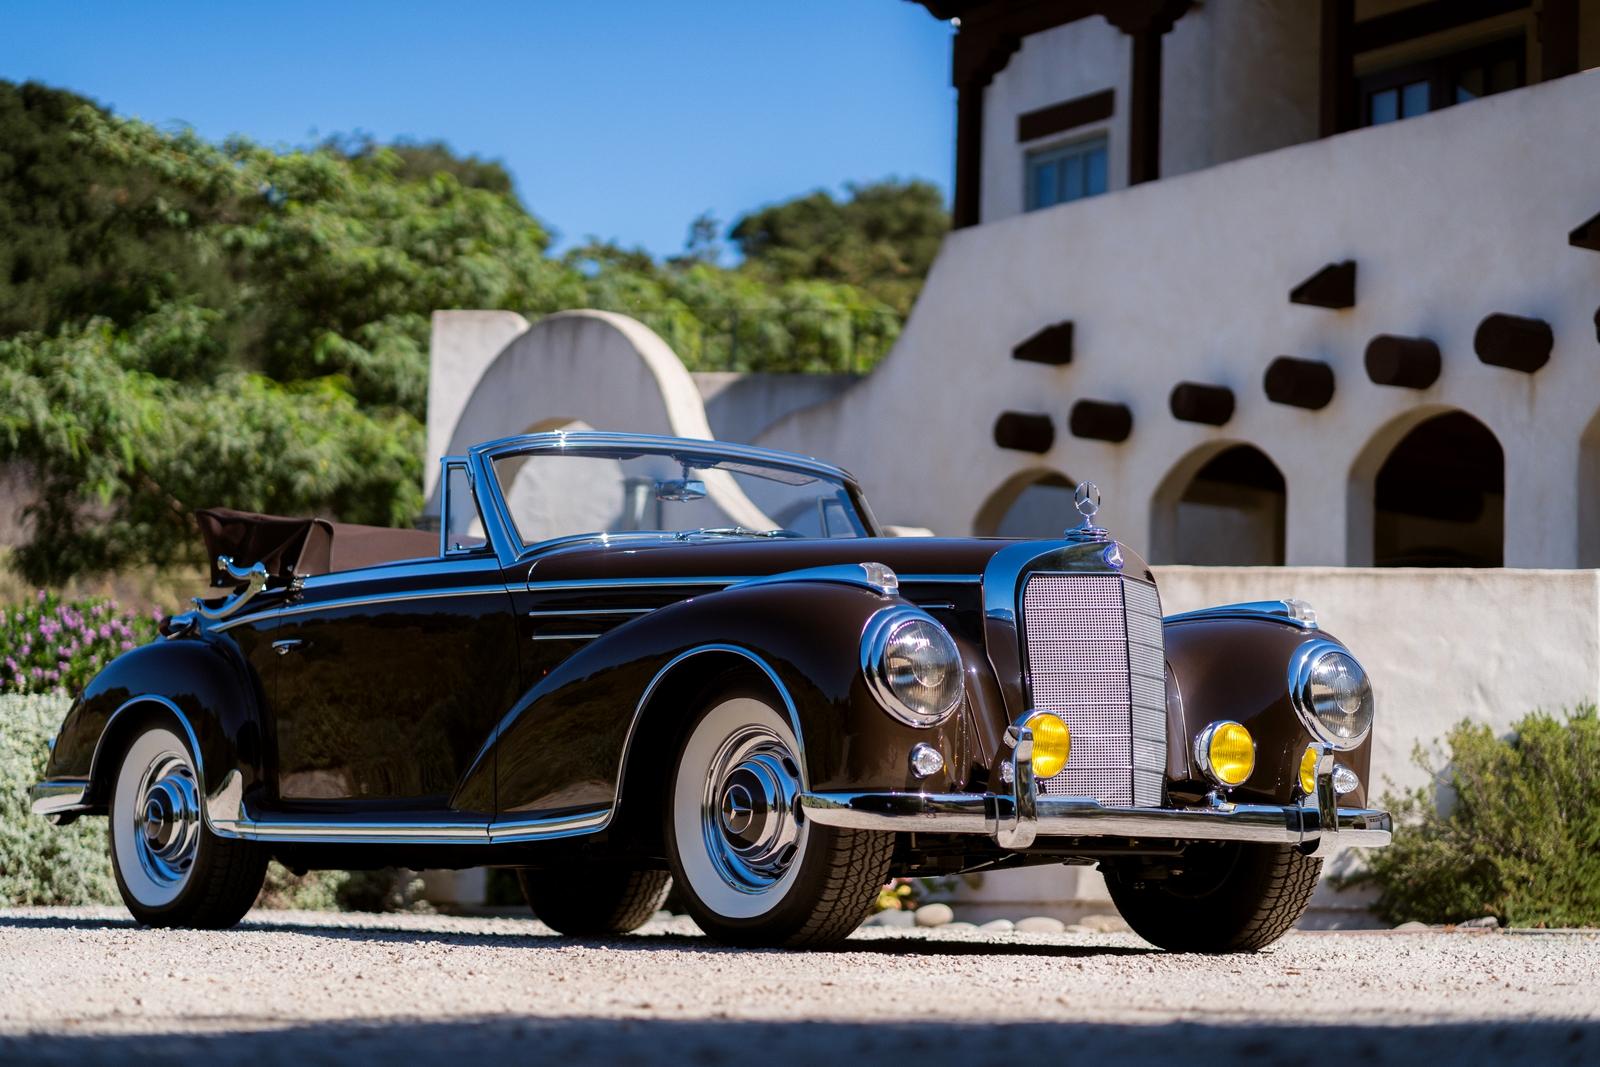 For Sale: 1956 Mercedes-Benz 300Sc Cabriolet